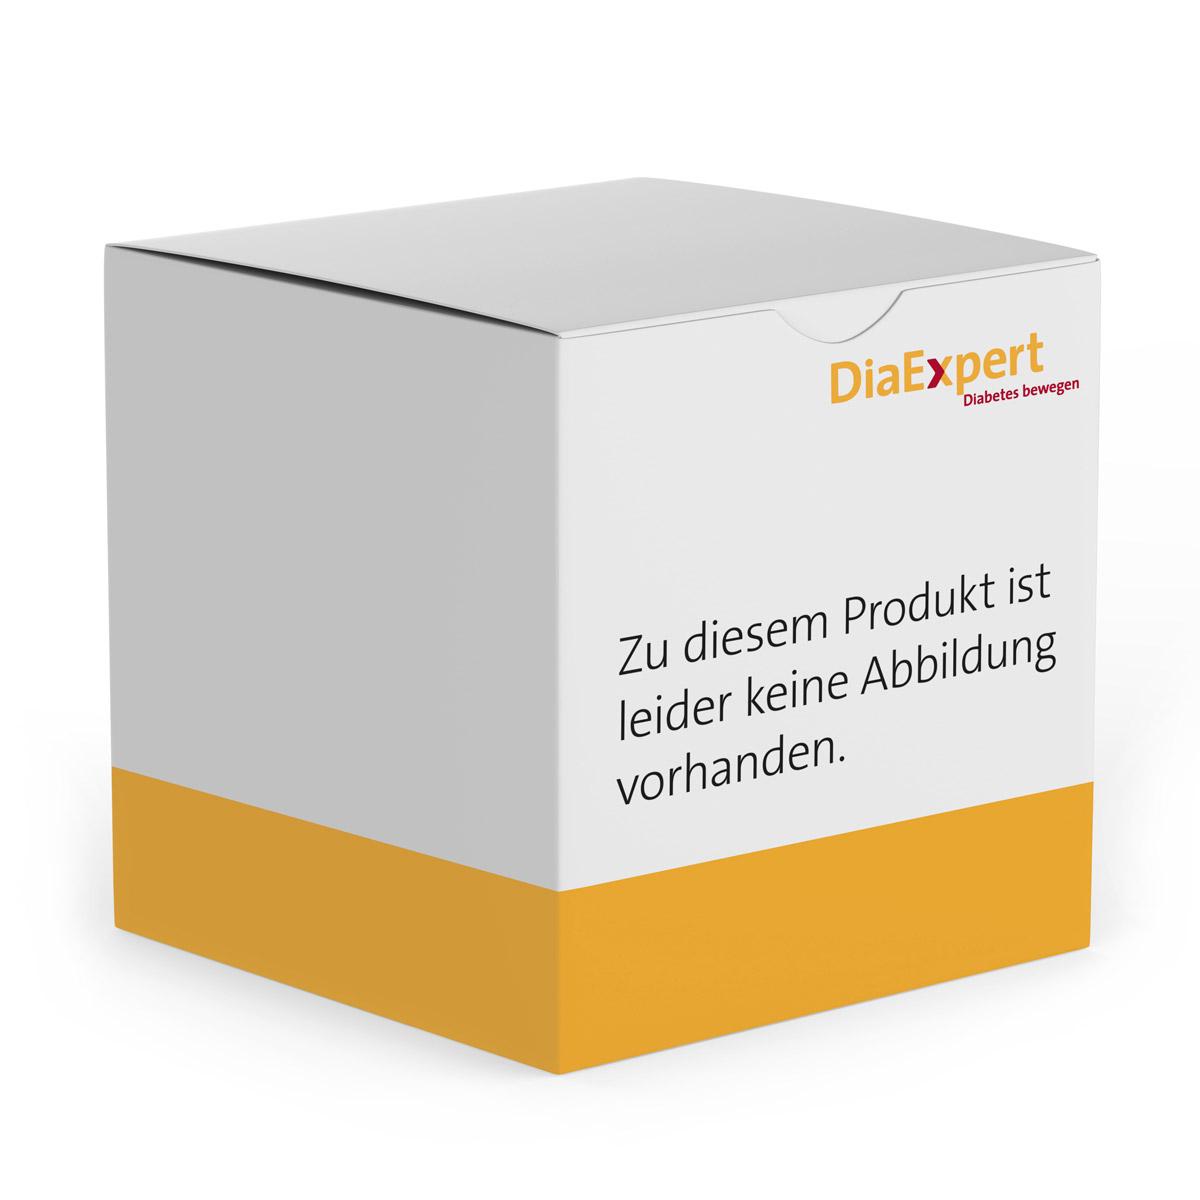 Traubenzucker-Würfel Cassis DiaExpert 1 Beutel à 50 Stück